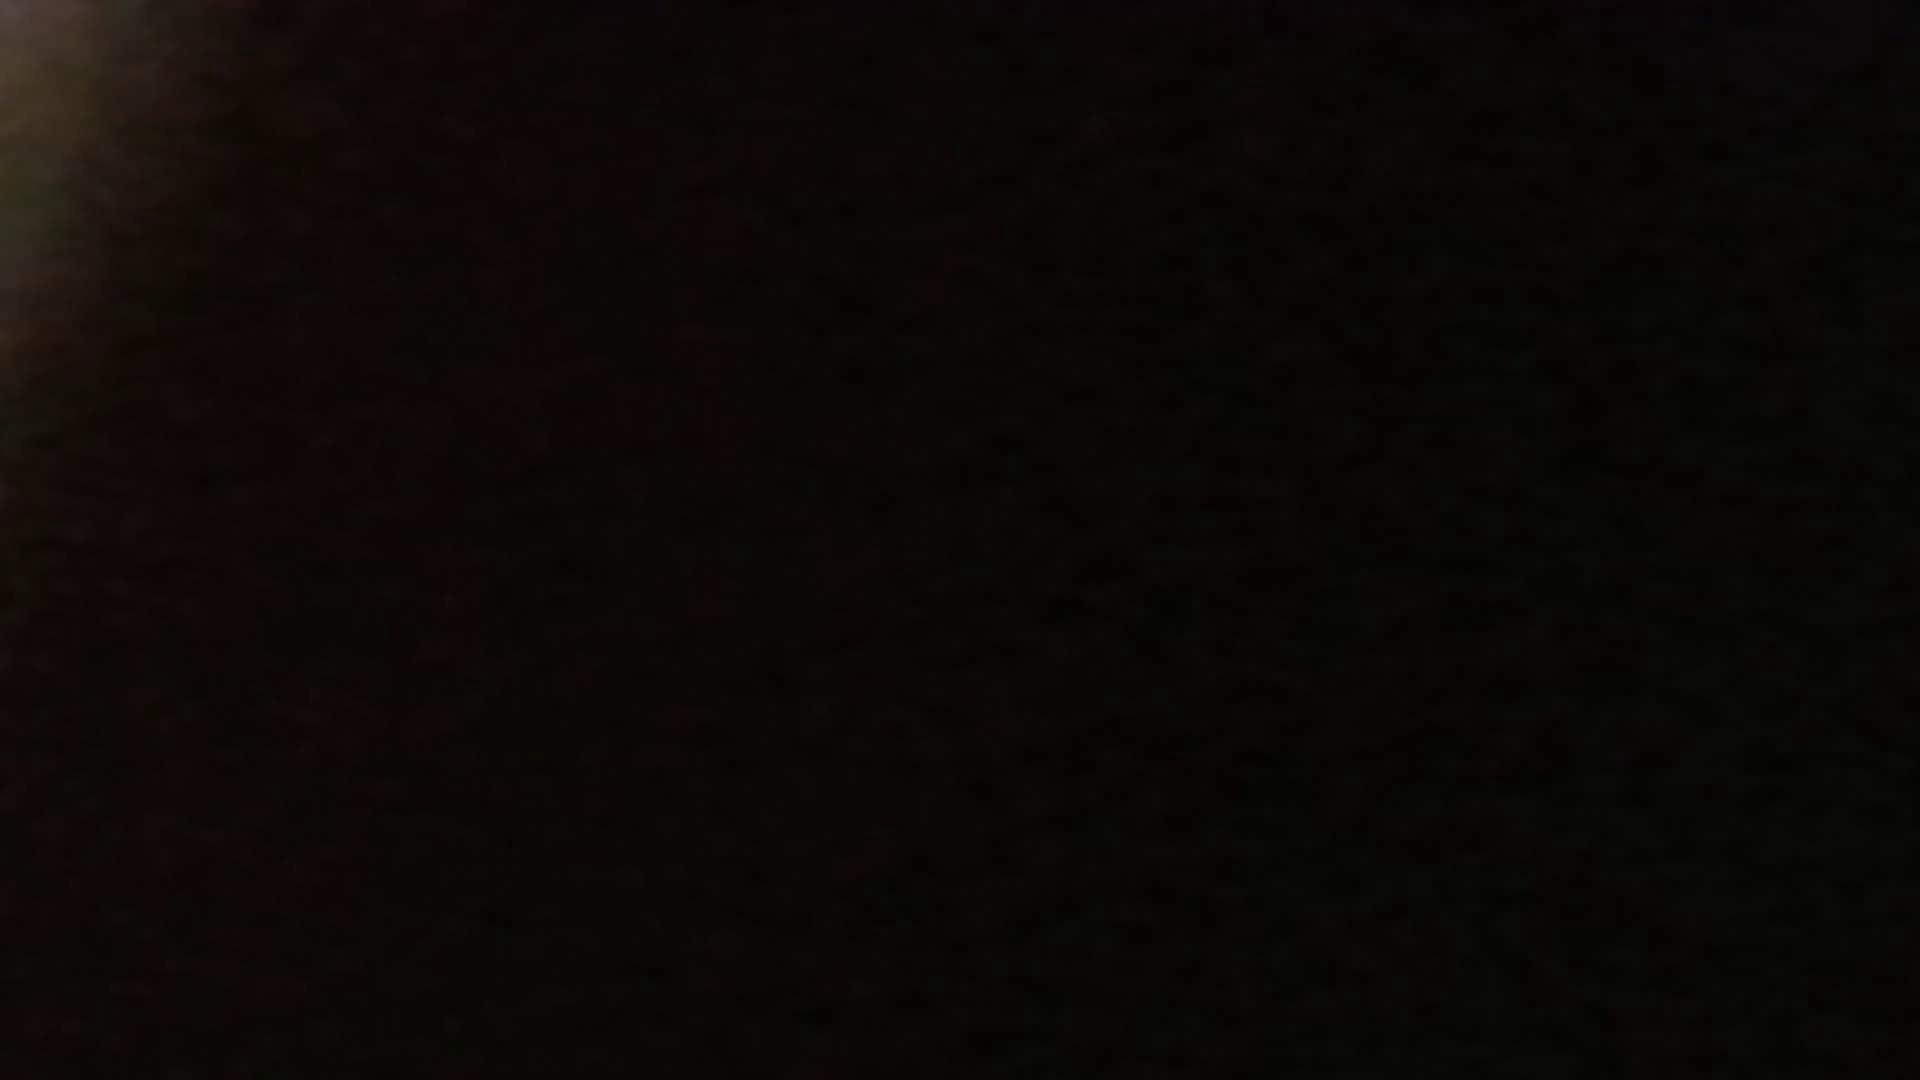 SPYさん初投稿!マンション覗き!5000K!ハイビジョン撮影VOL.03(元野球部社会人編) 完全無修正  109pic 25